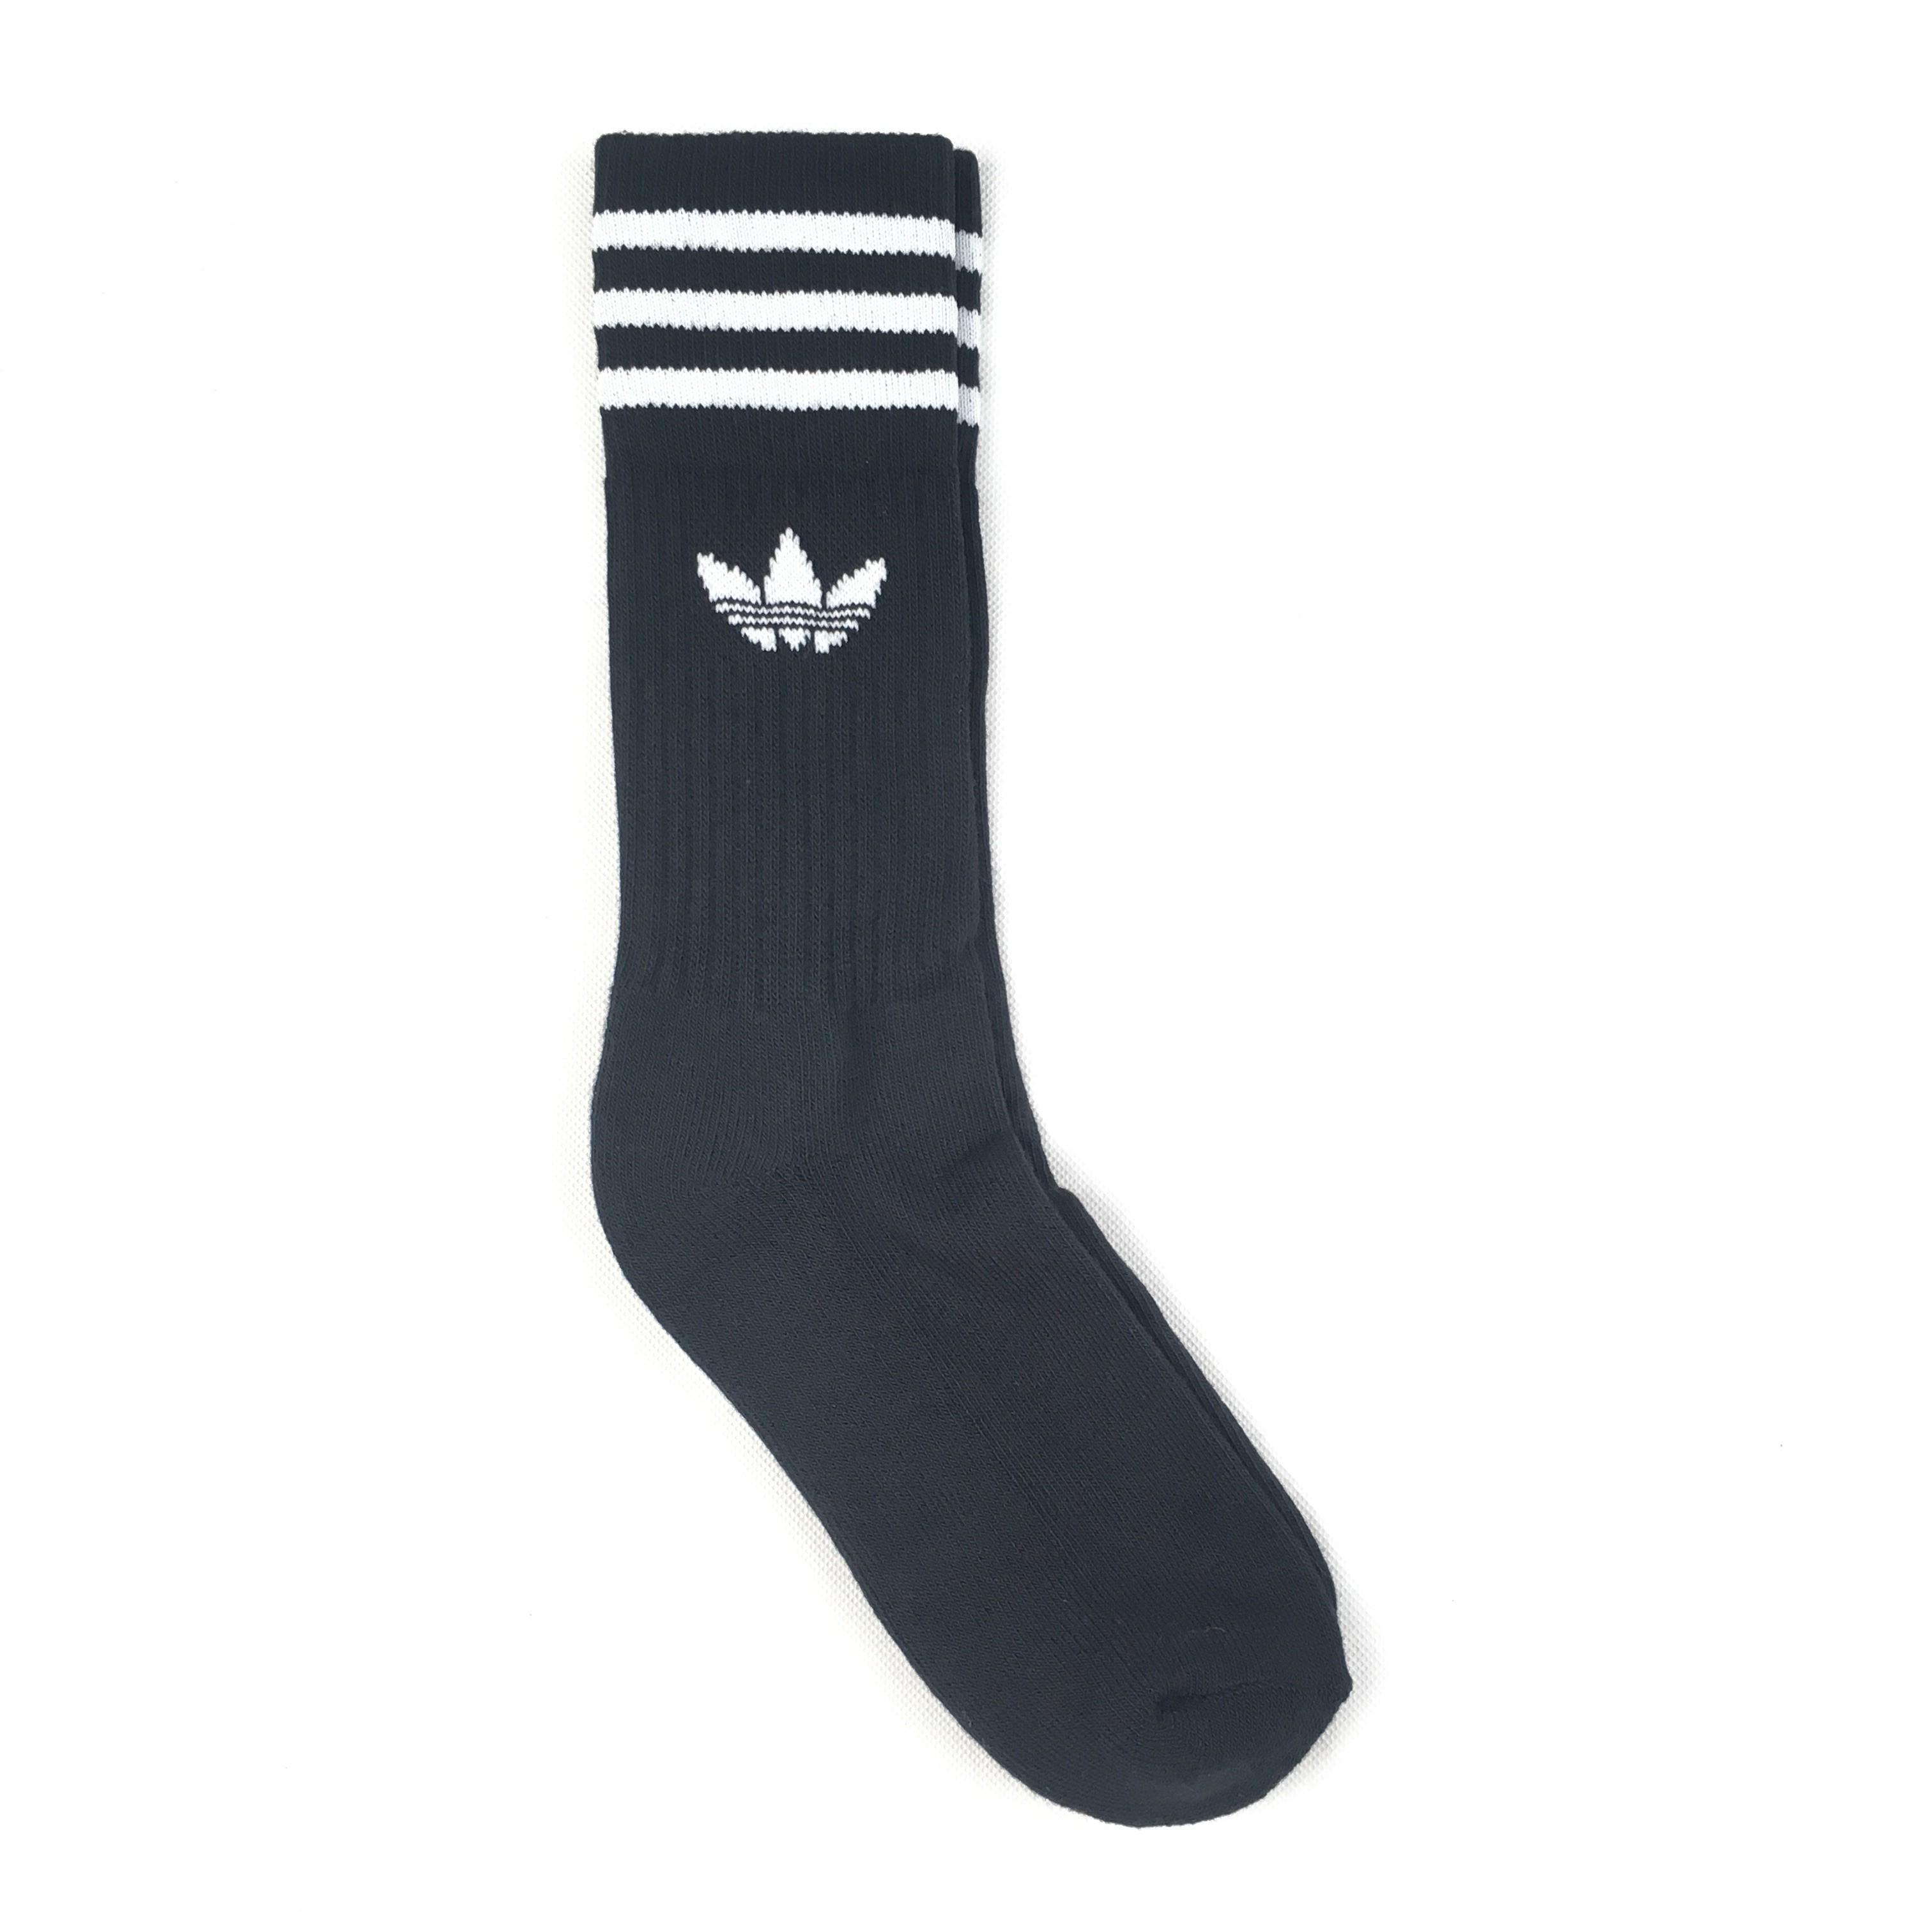 f17bbfec872 Ponožky adidas Originals Crew Černé 39-42 - Glami.sk